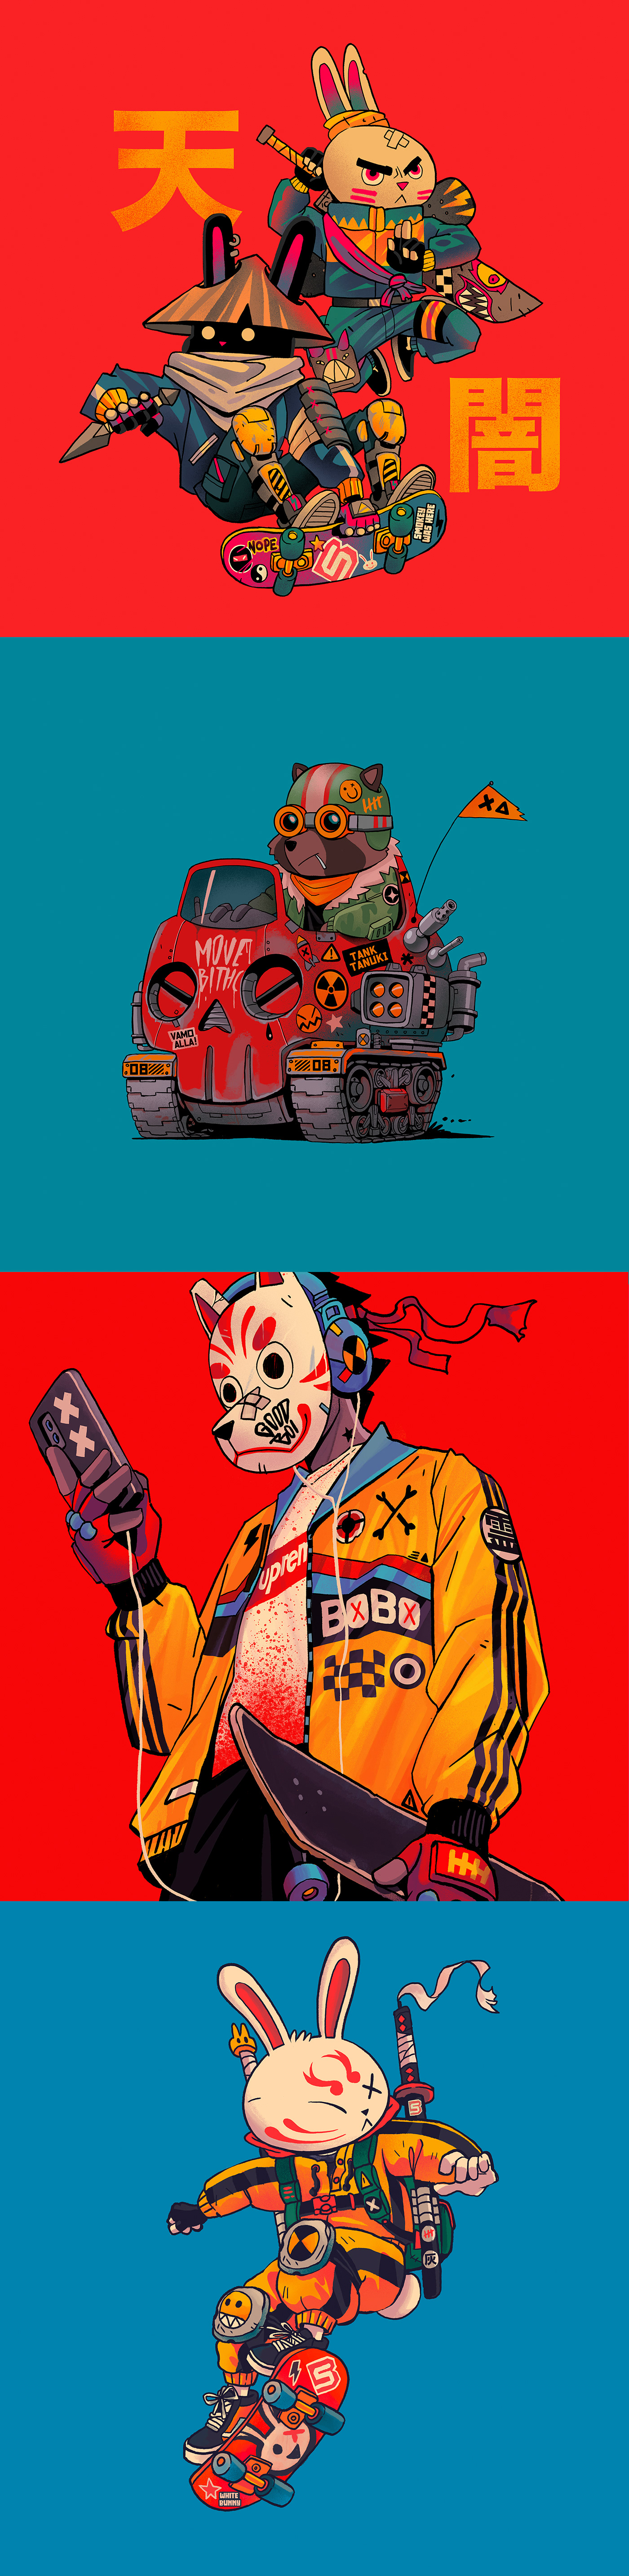 animal characters Cyberpunk Gaming japan Japanese Aesthetic katana neotokyo Retro skateboarding